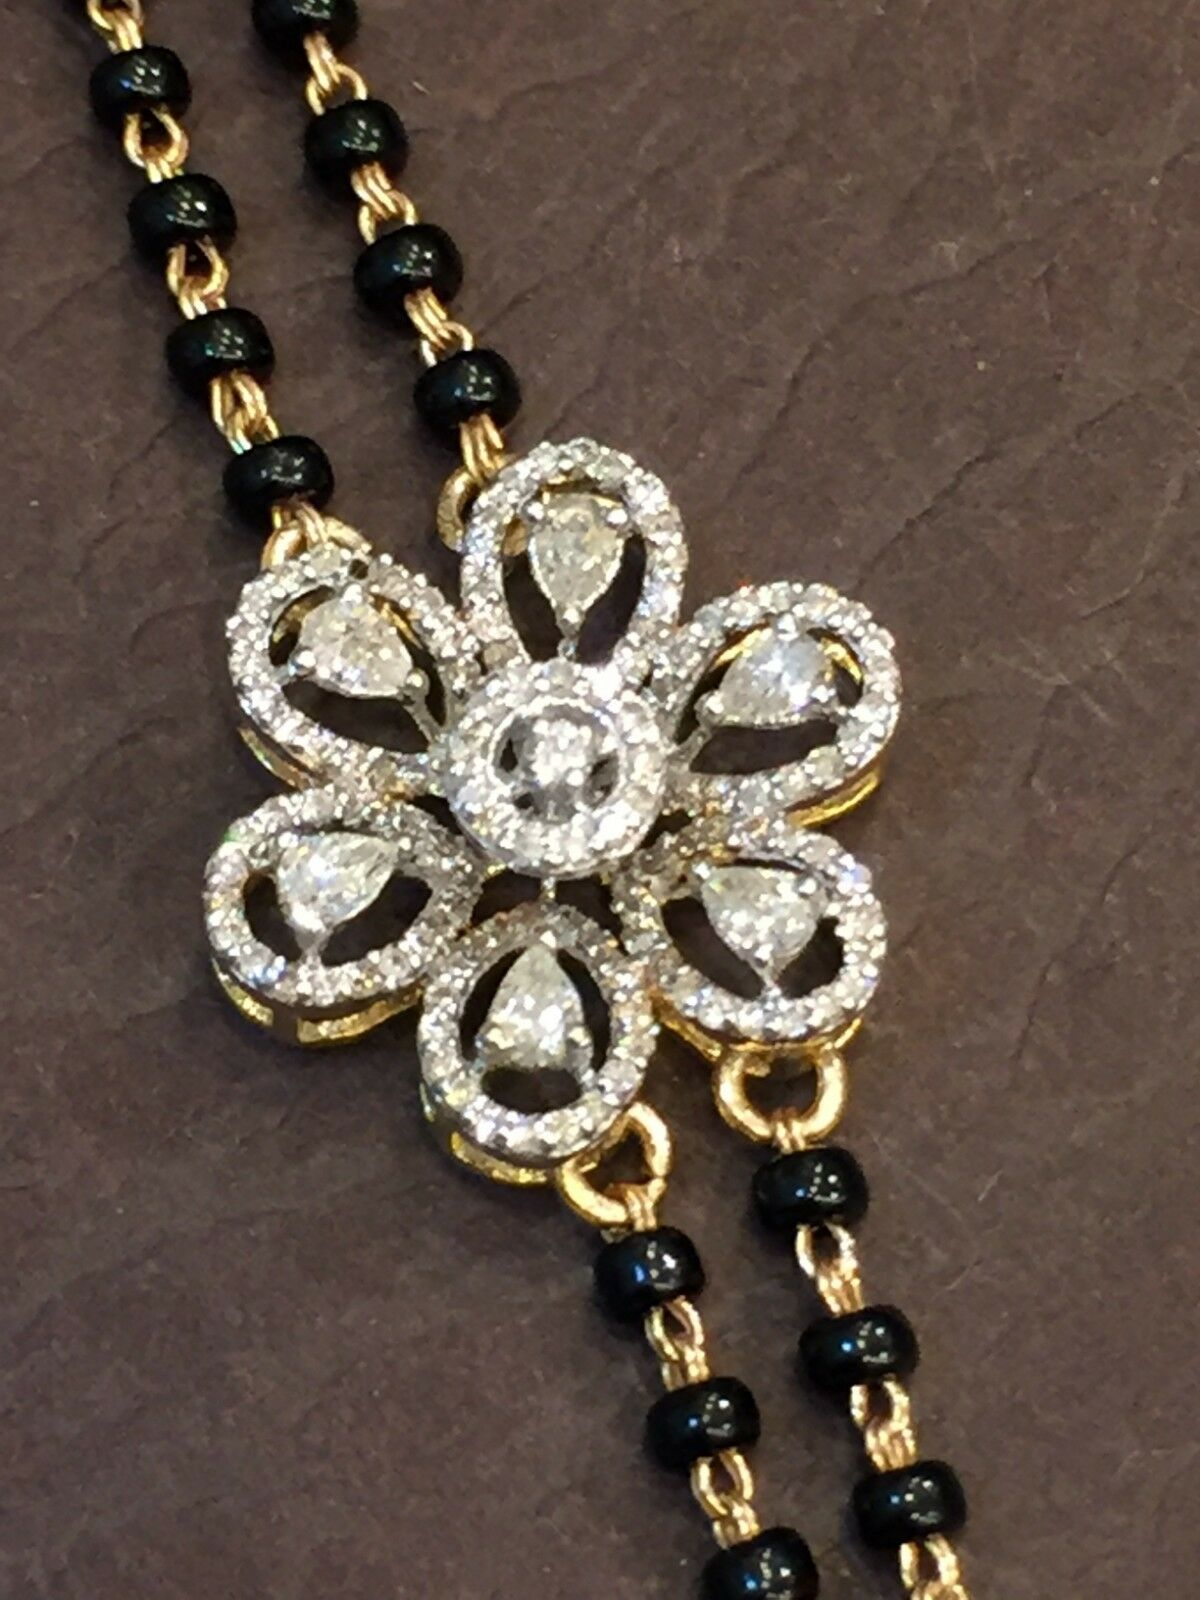 Pave 0.73 Carats Round Pear Cut Diamonds Bead Bracelet In Fine Hallmark 14K gold